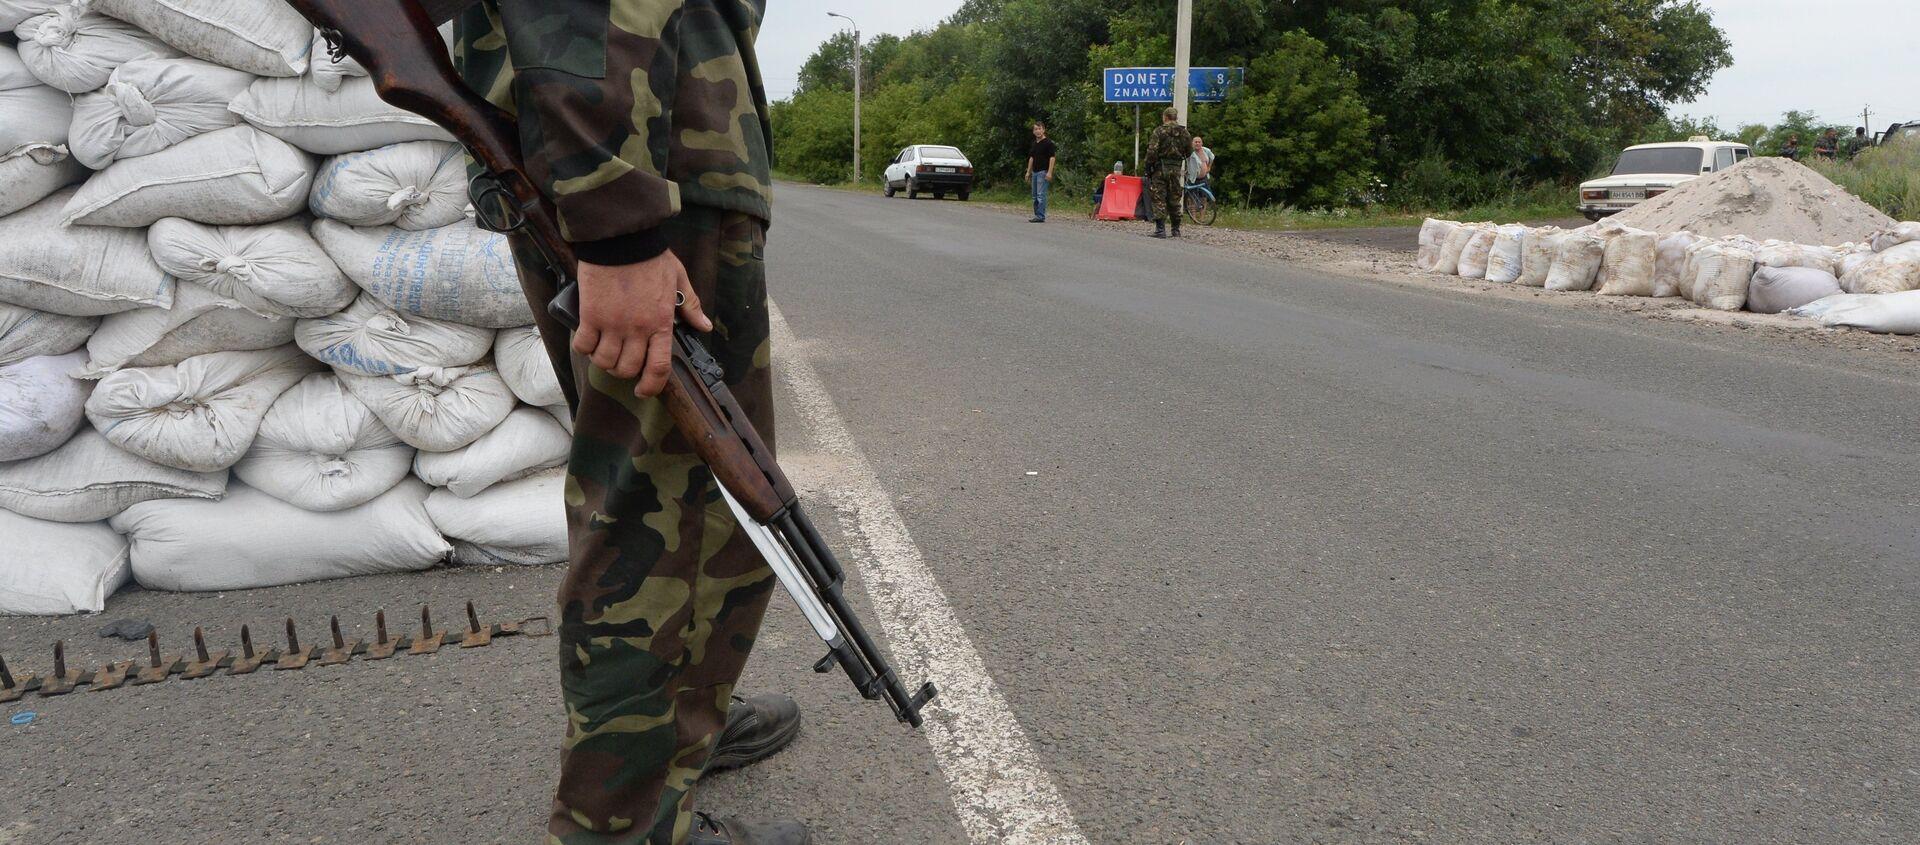 Militia checkpoint in Debaltseve, Donetsk Region - Sputnik International, 1920, 11.04.2021